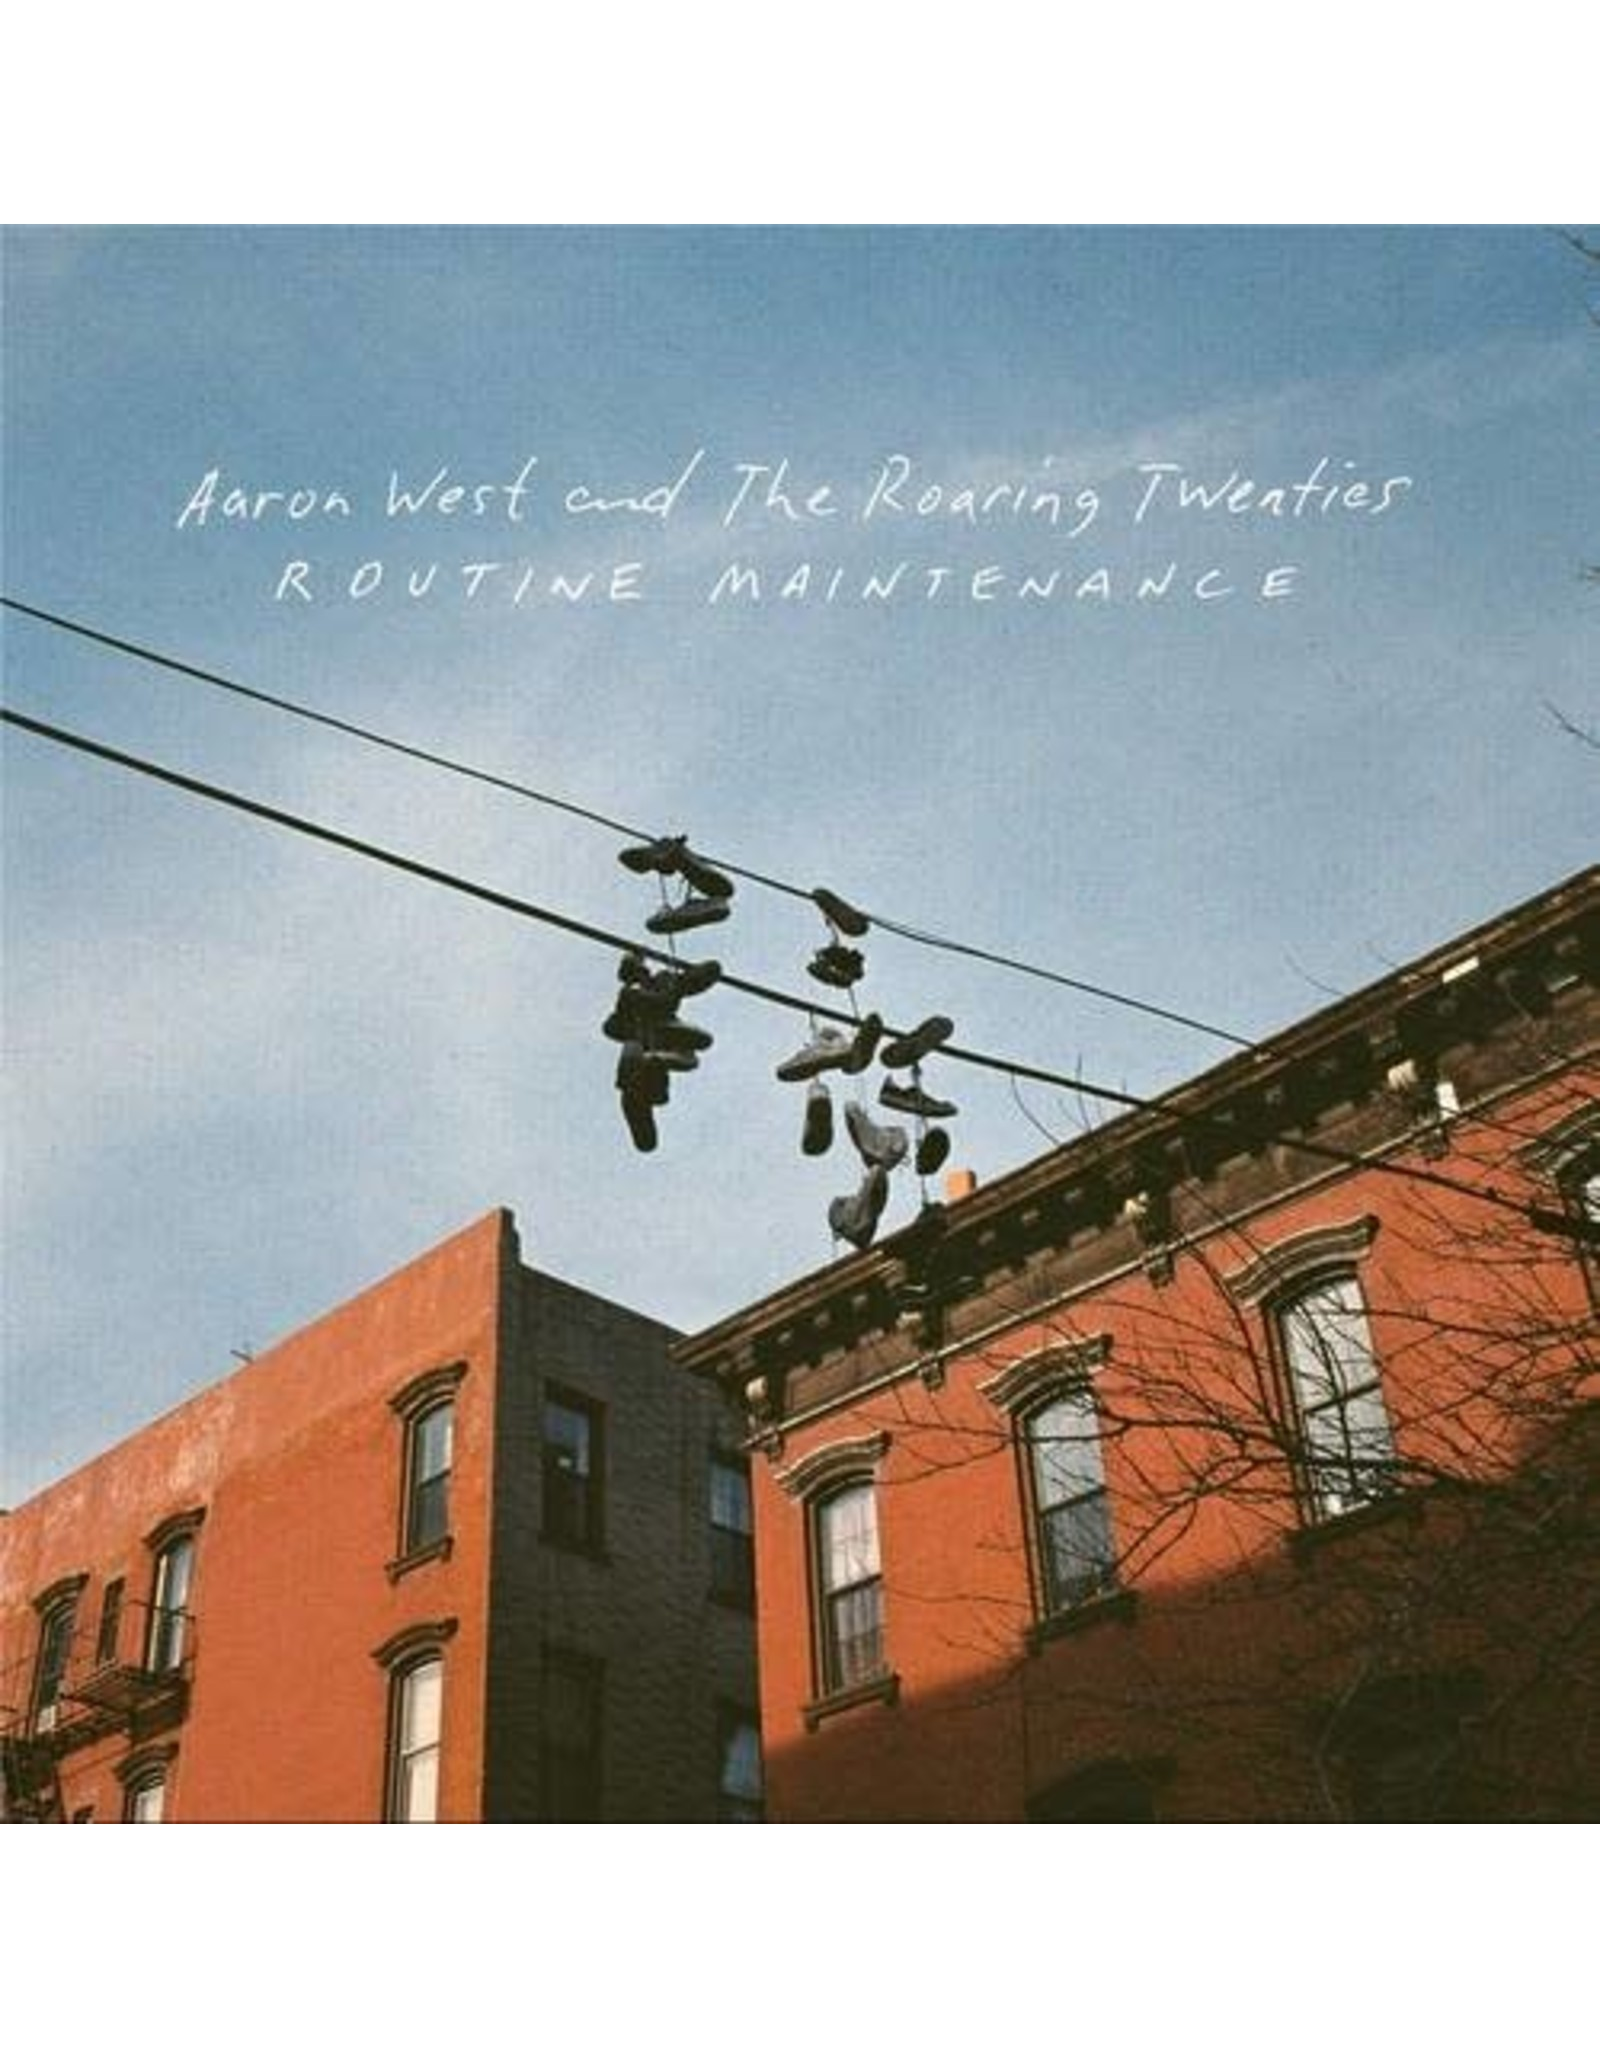 West, Aaron & the Roaring Twenties - Routine Maintenance LP